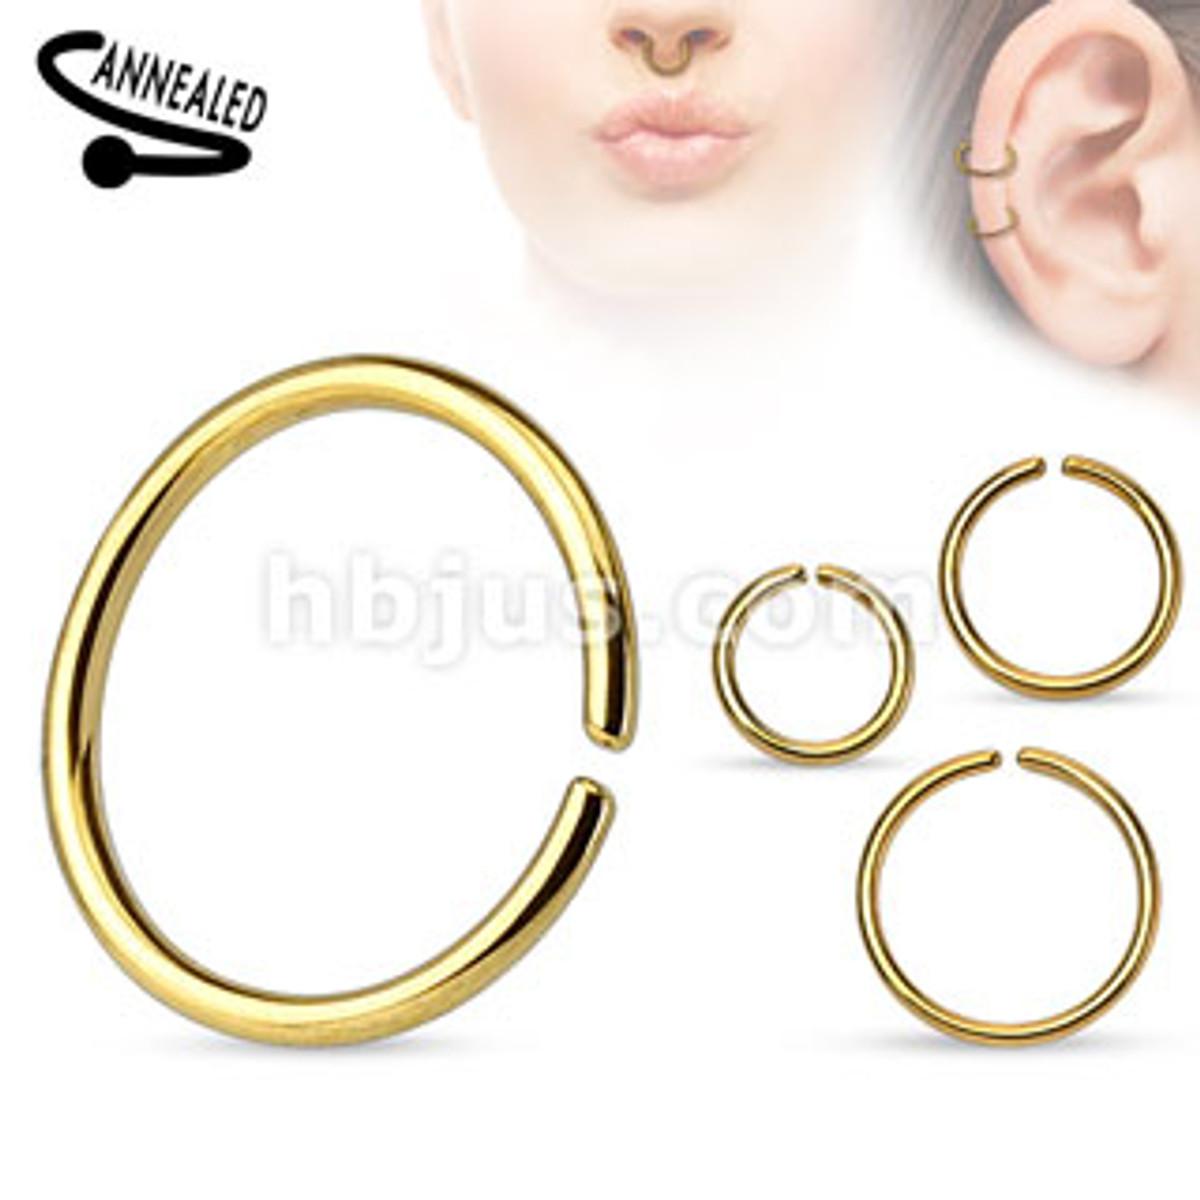 6mm body ring-gold/20 gauge